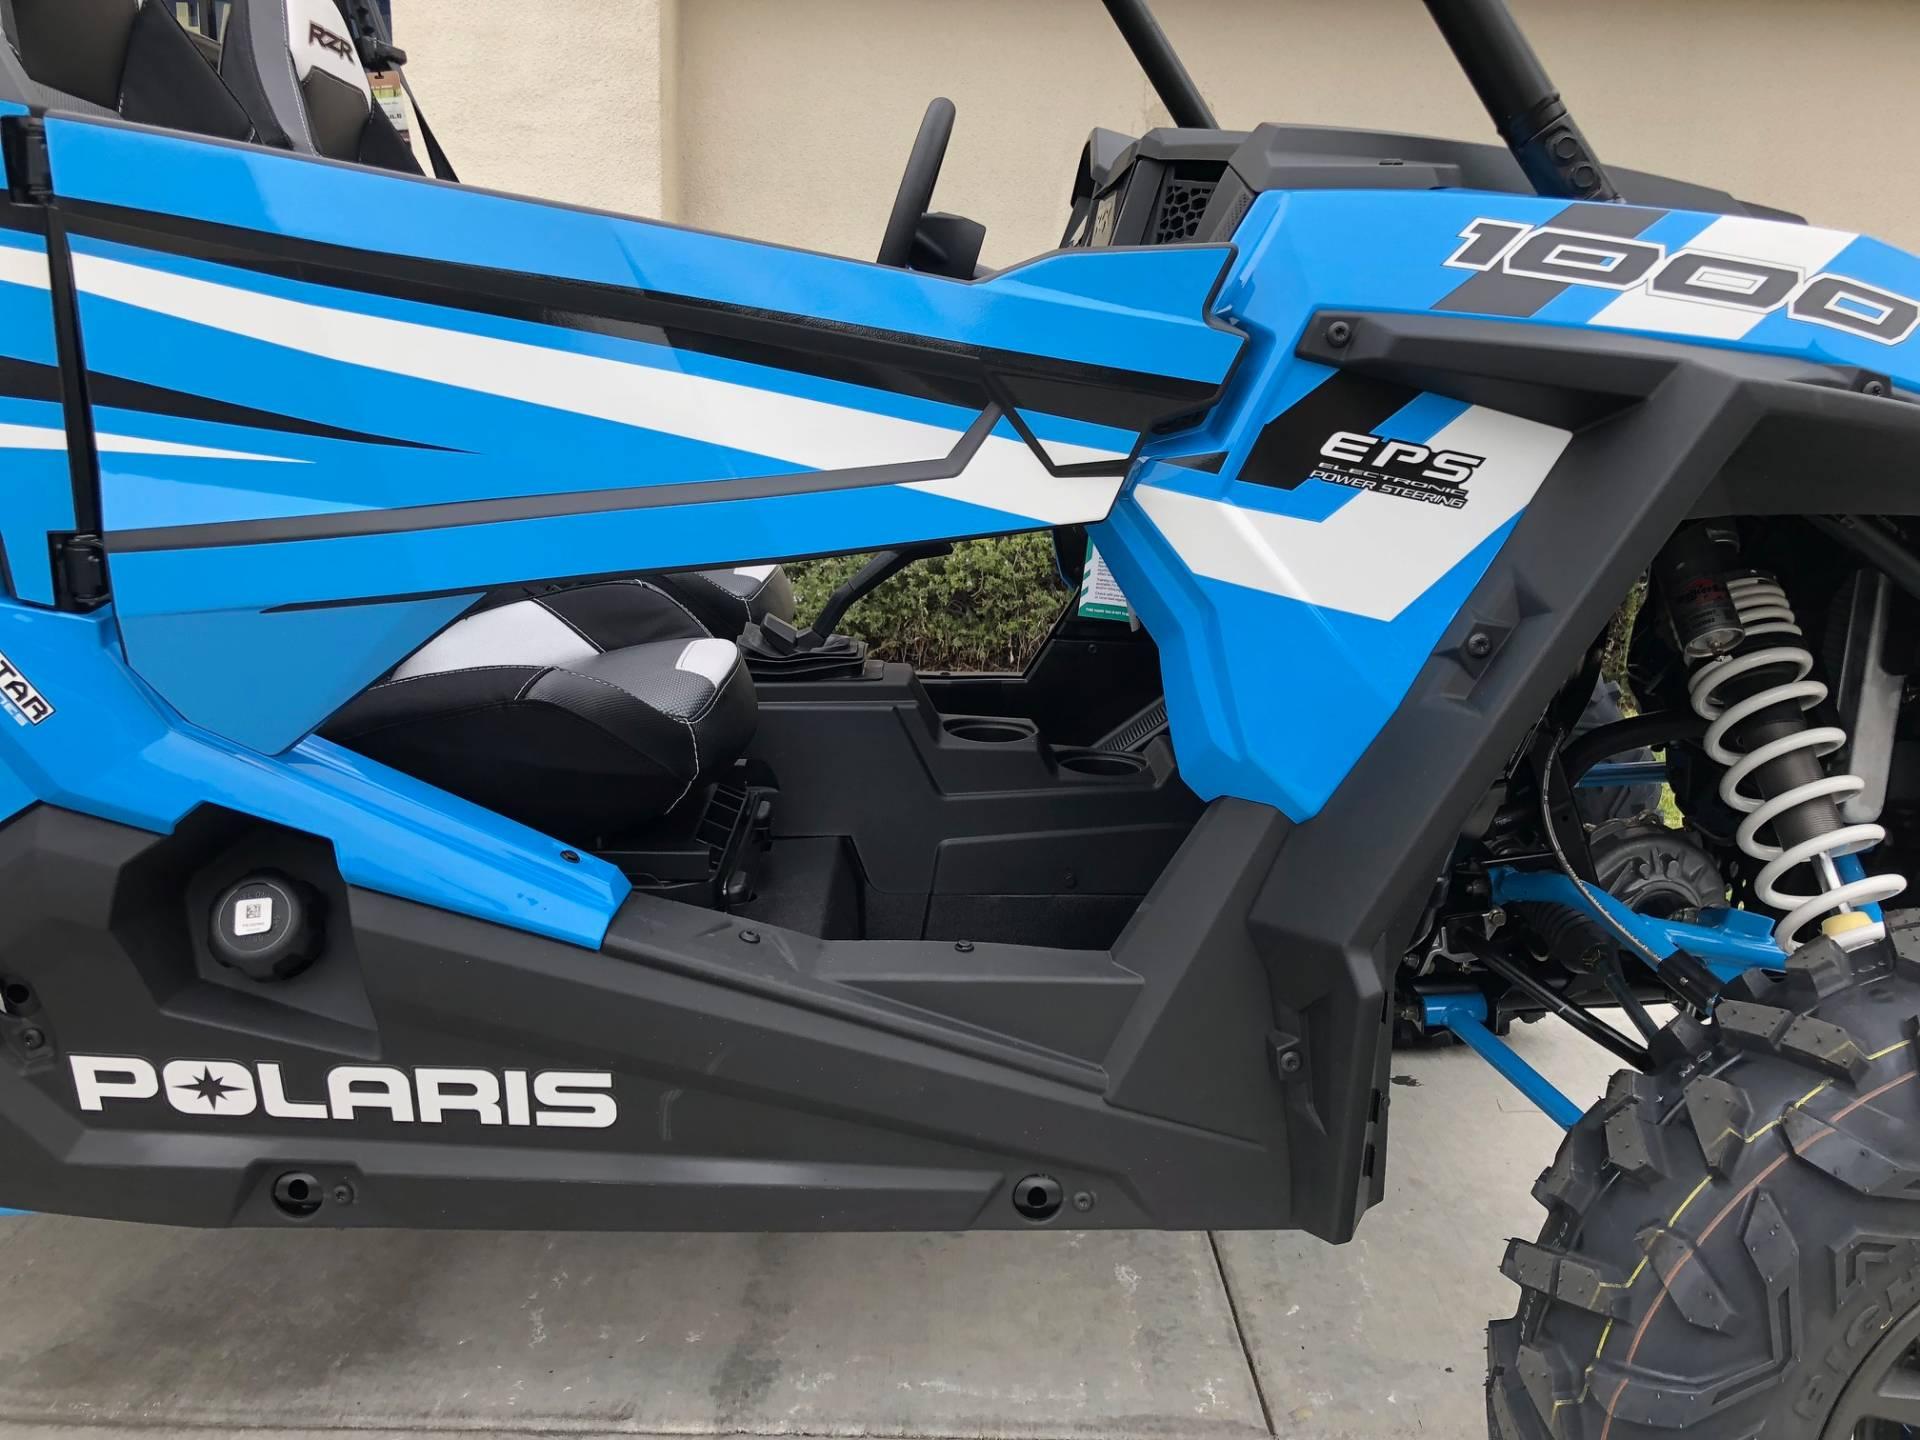 МОТОВЕЗДЕХОД POLARIS RZR XP 1000 EPS Sky Blue  Артмото - купить квадроцикл в украине и харькове, мотоцикл, снегоход, скутер, мопед, электромобиль